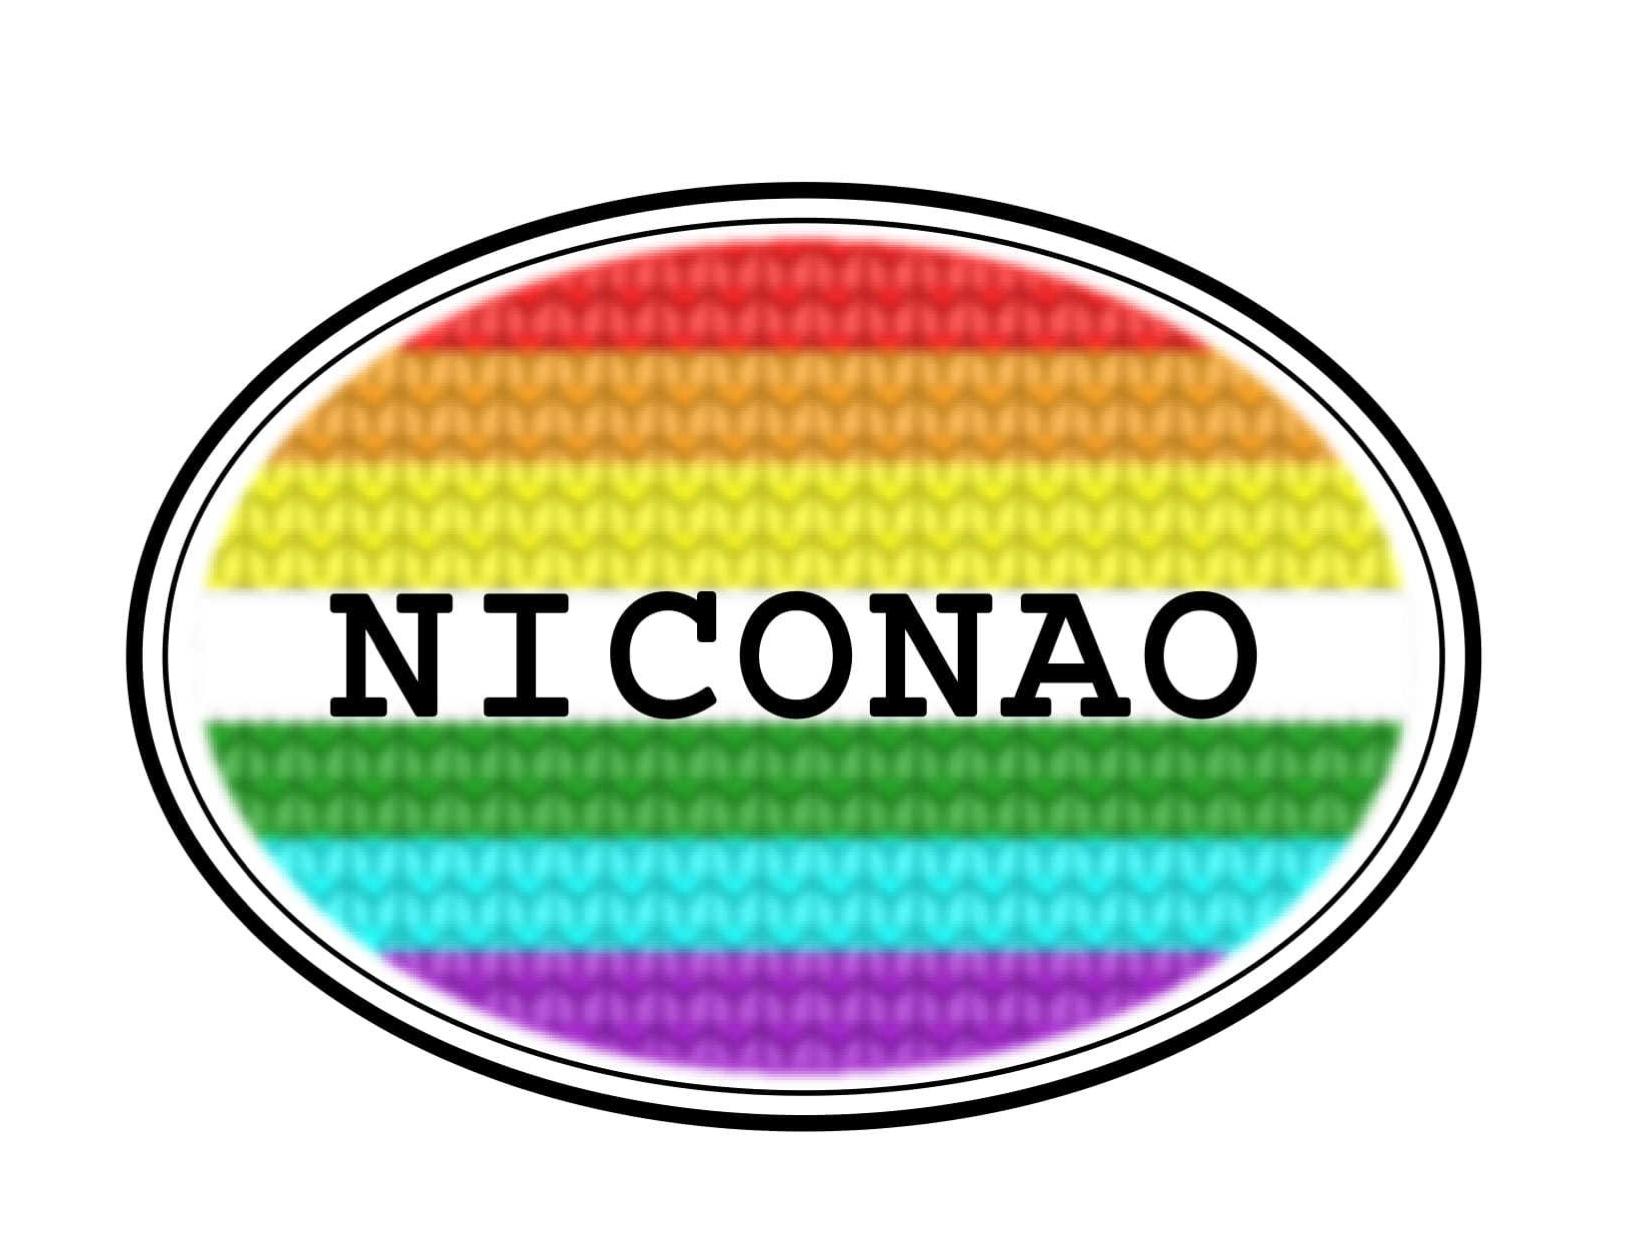 NICONAO